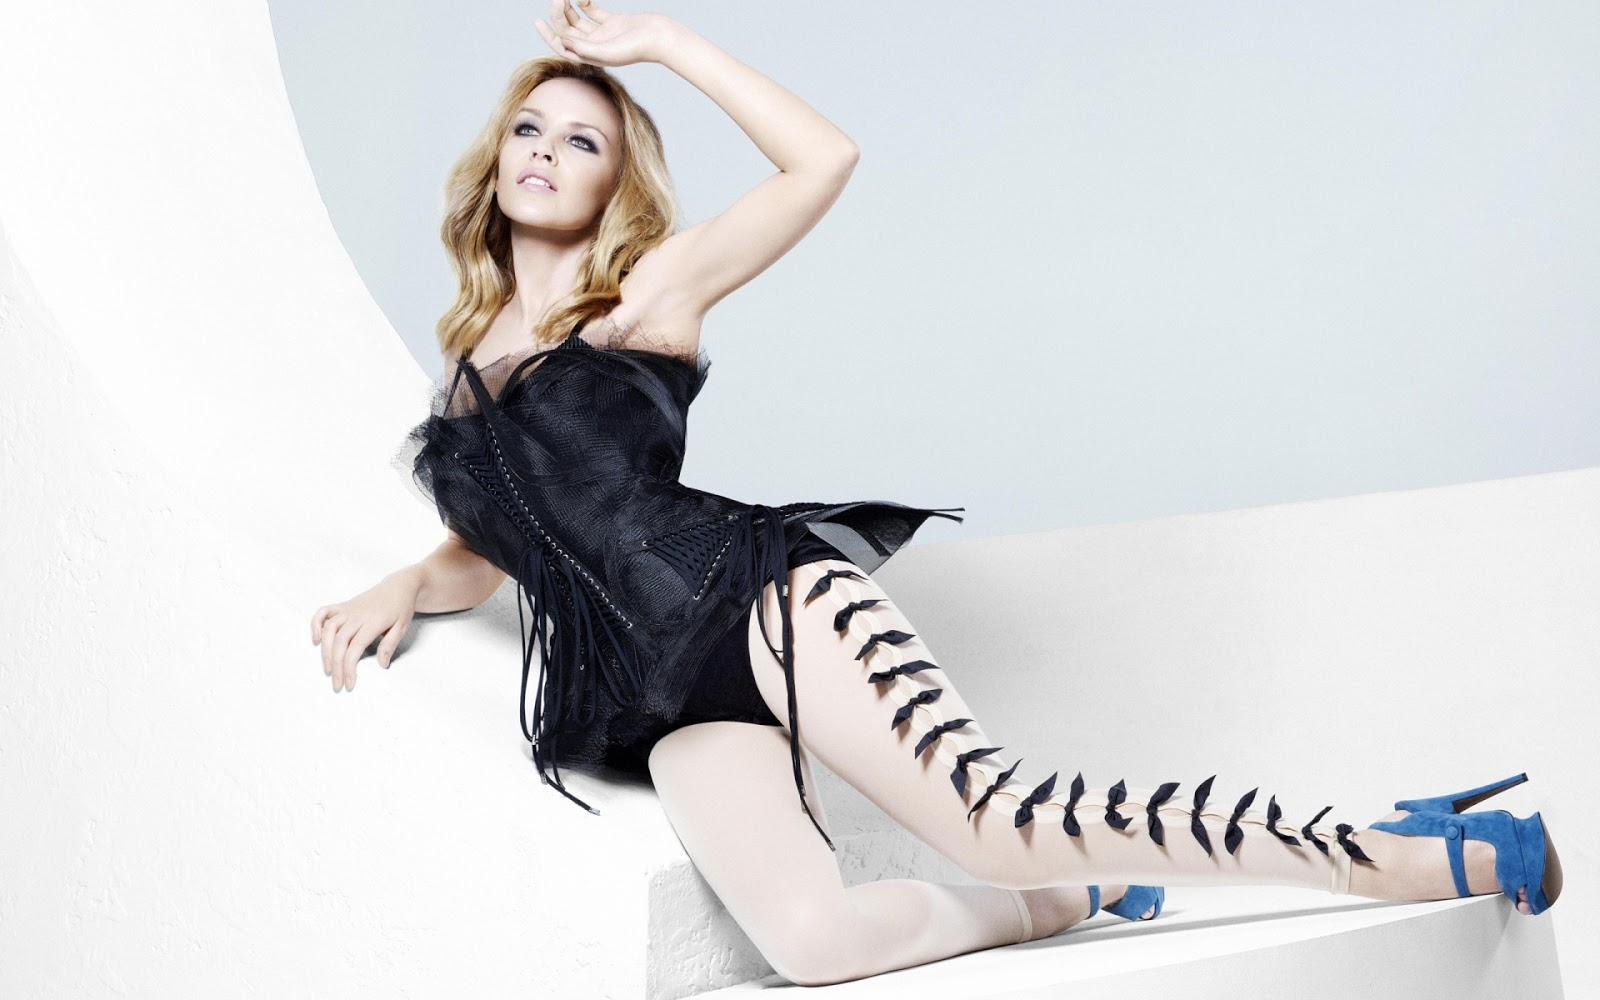 Australian Kylie Minogue